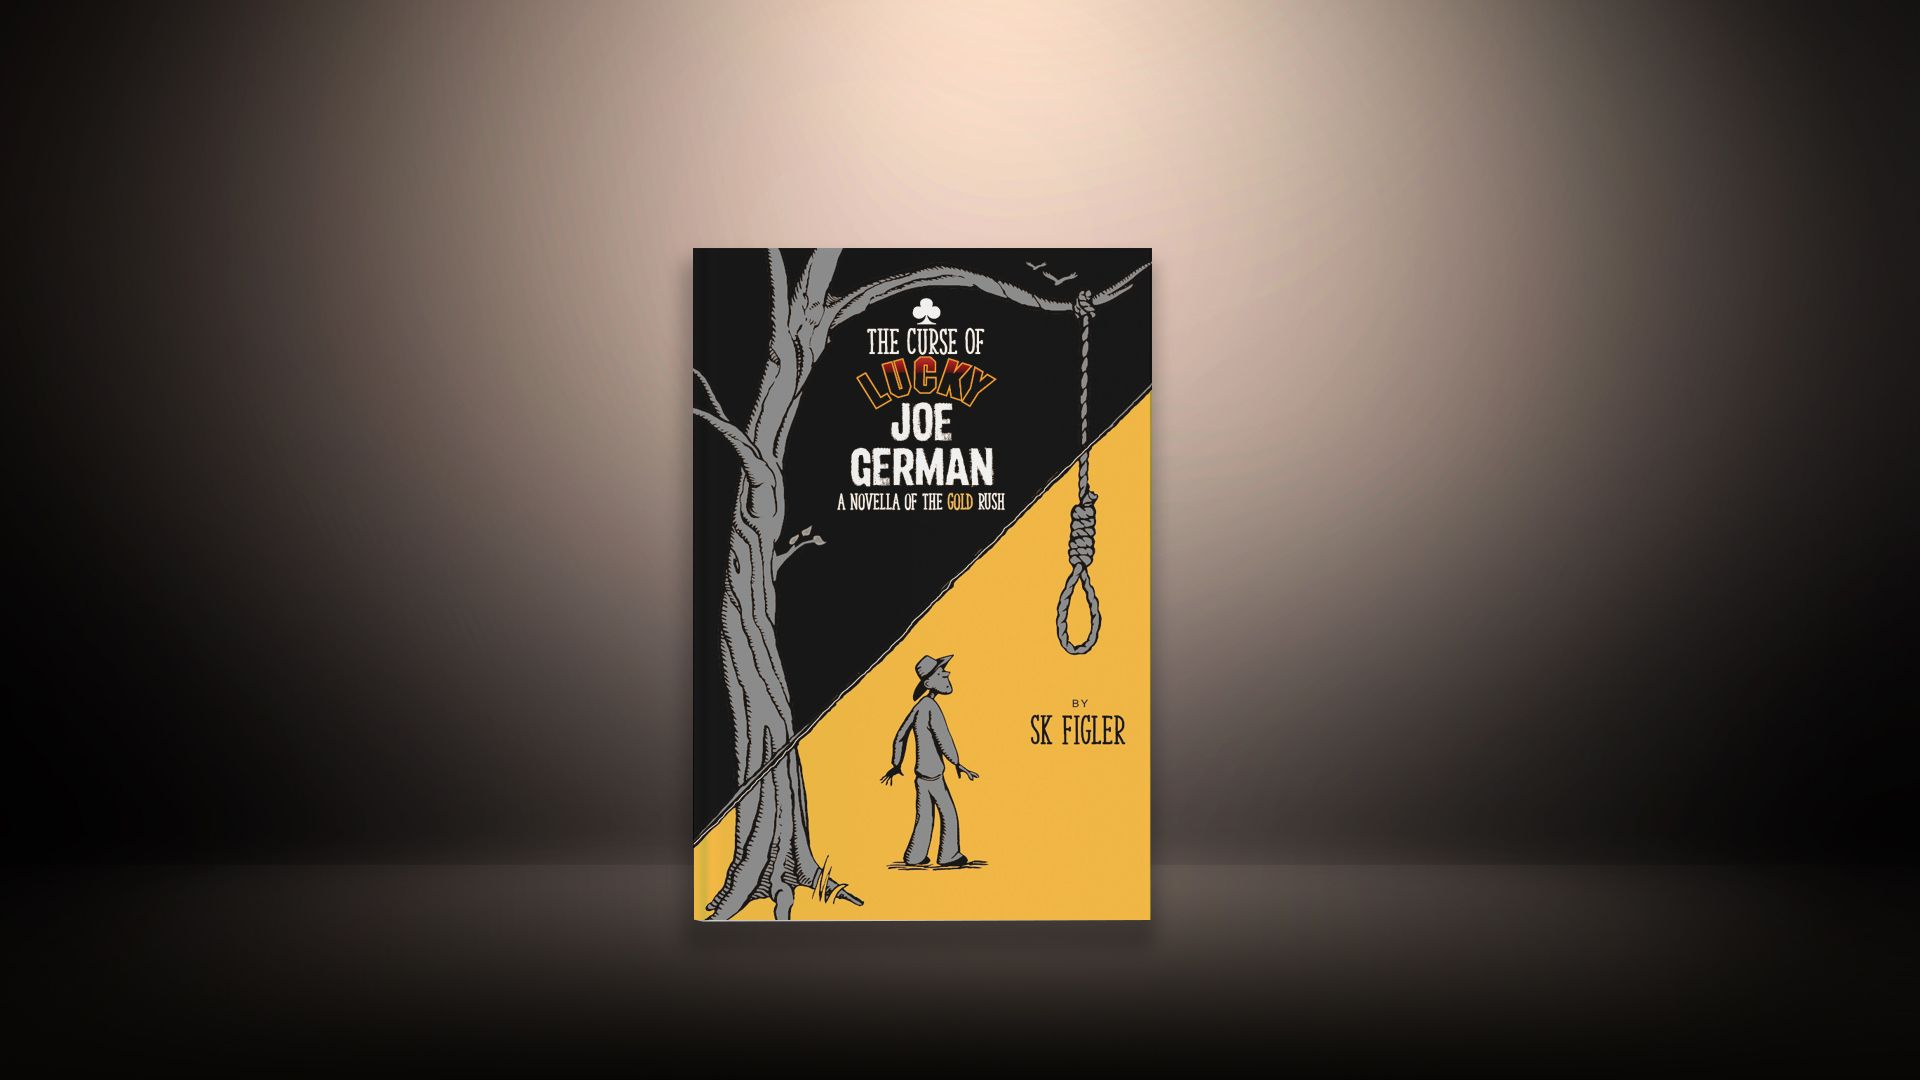 The Curse of Lucky Joe German by Stephen K Figler